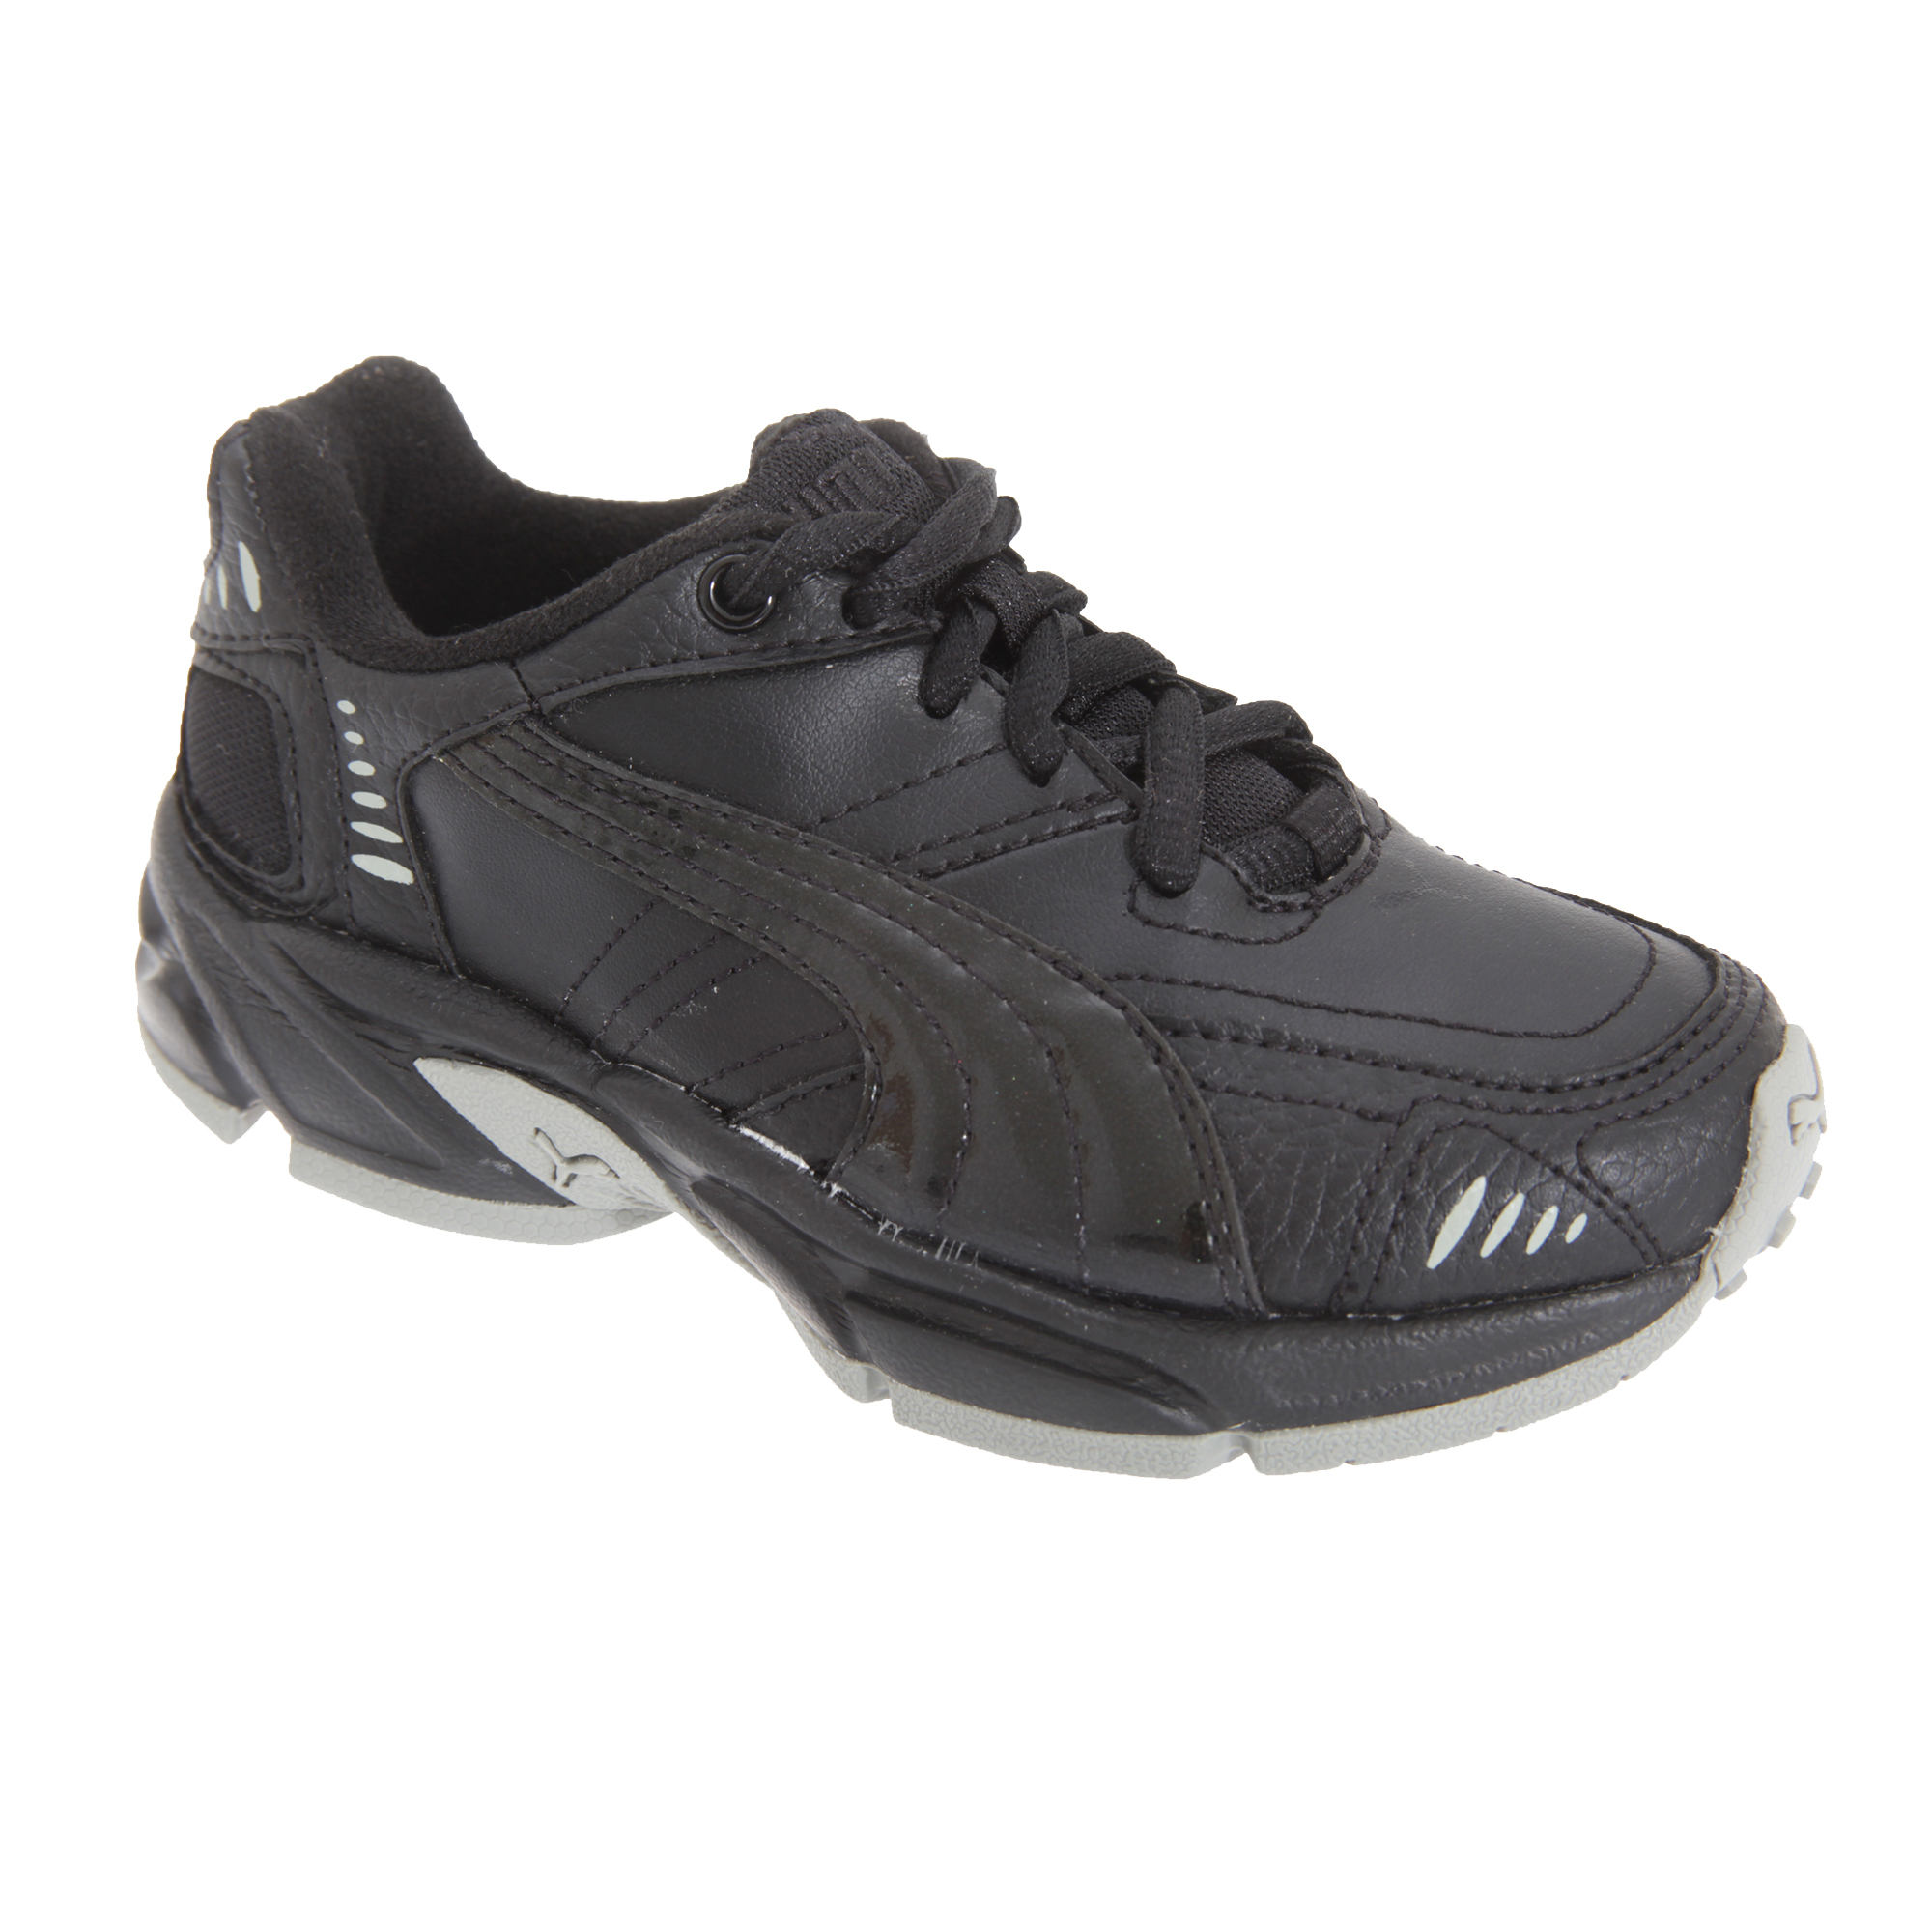 Puma Axis/Hahmer Junior Lace Non-Marking Trainer / Boys Trainers / Unisex Sports (13 UK Junior) (Black)